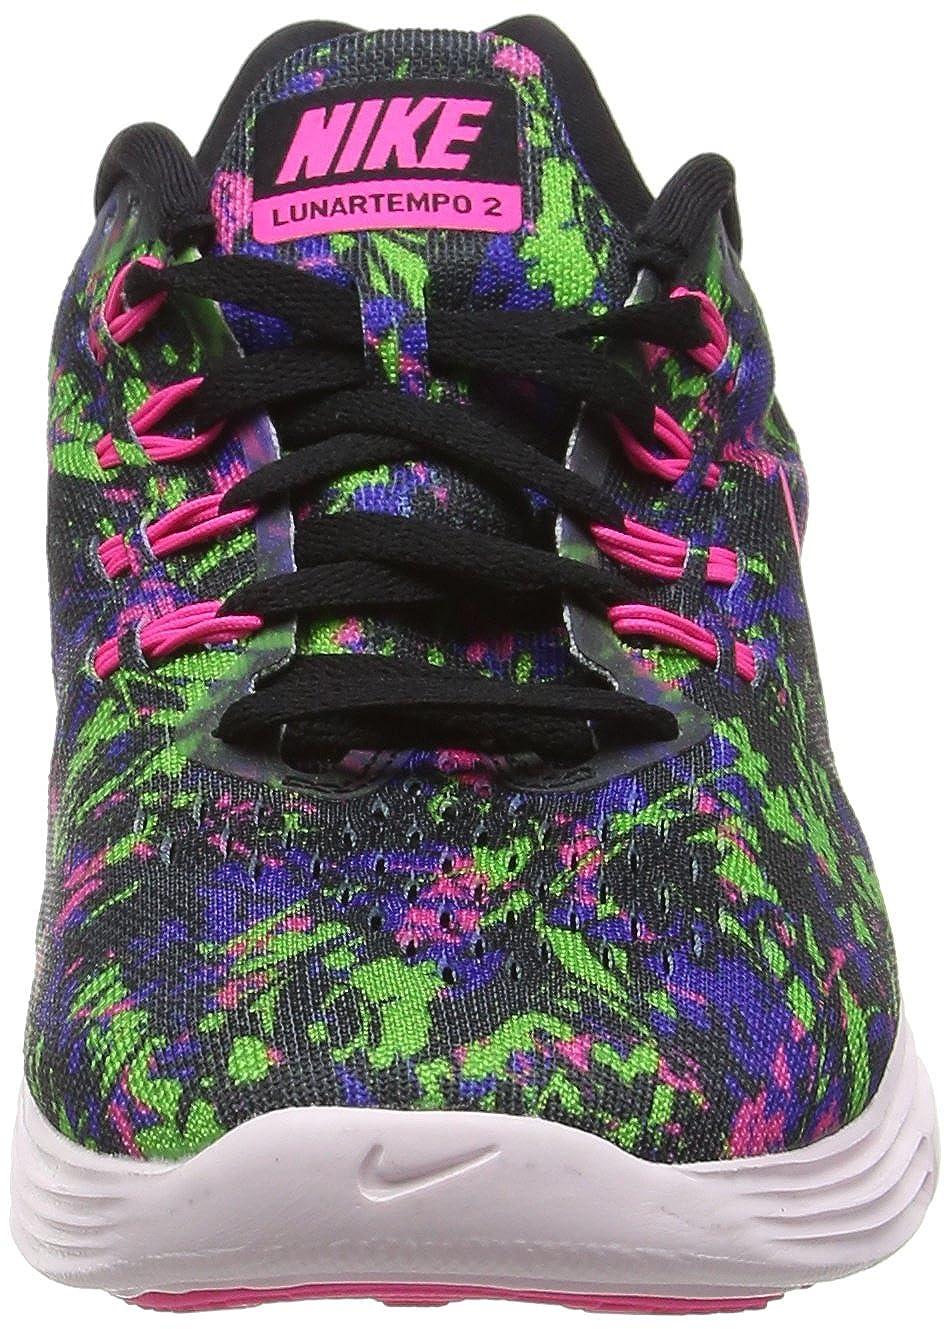 official photos 55df7 7ff9b Nike Lunar Tempo 2 Print, Chaussures de Running Compétition Femme   Amazon.fr  Chaussures et Sacs